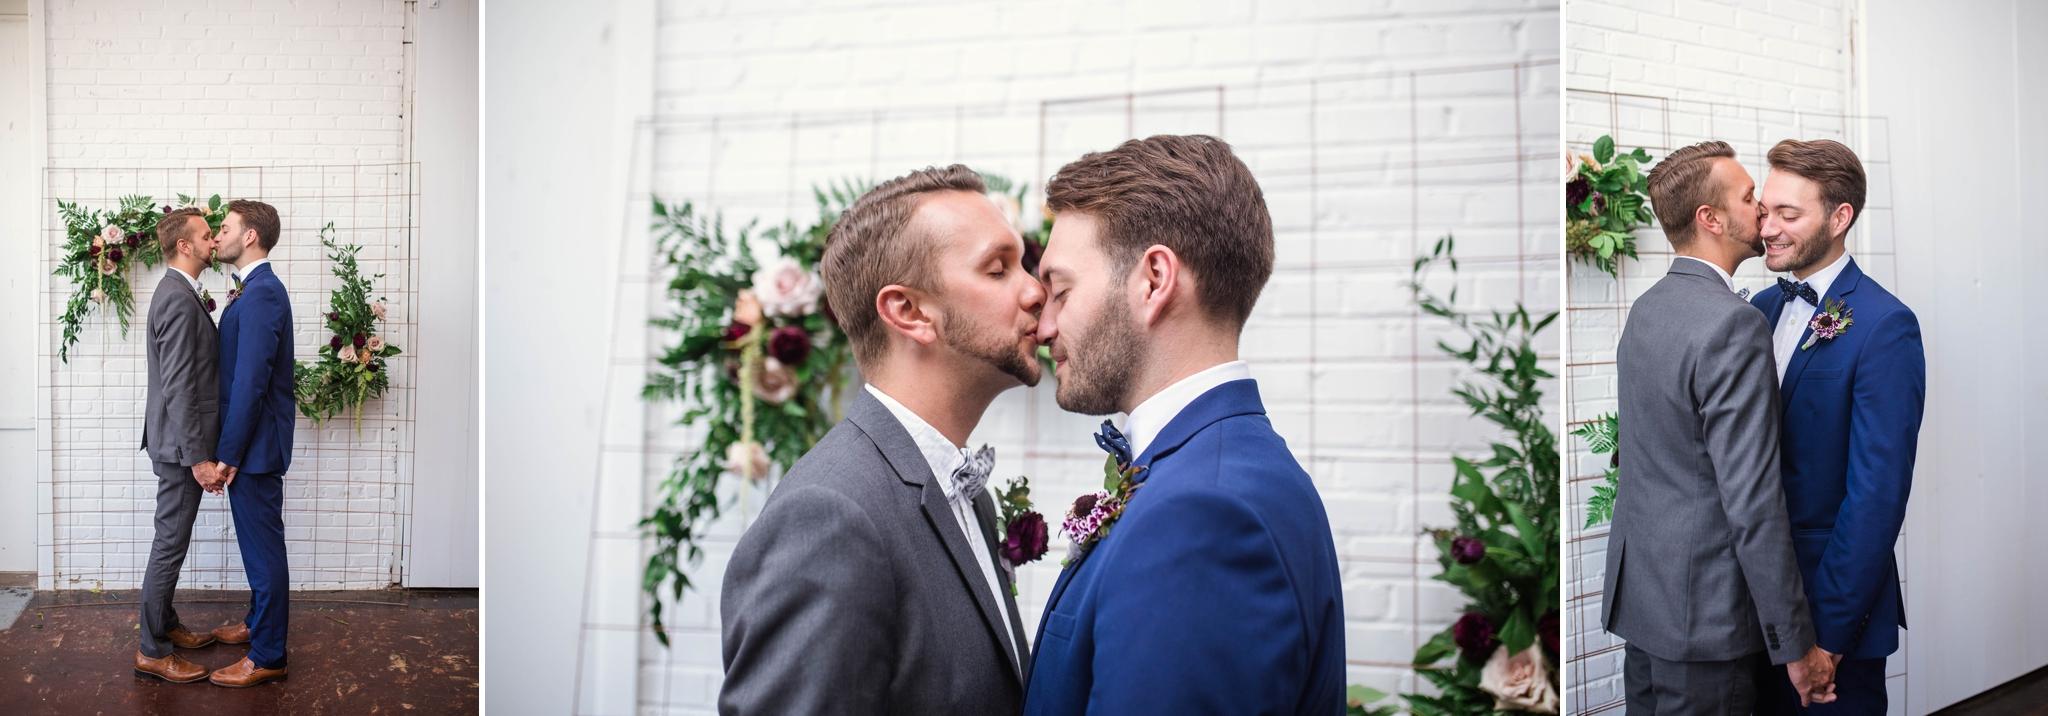 Gay and Lesbian friendly Wedding Photographer in Raleigh North Carolina - Johanna Dye Photography 7.jpg